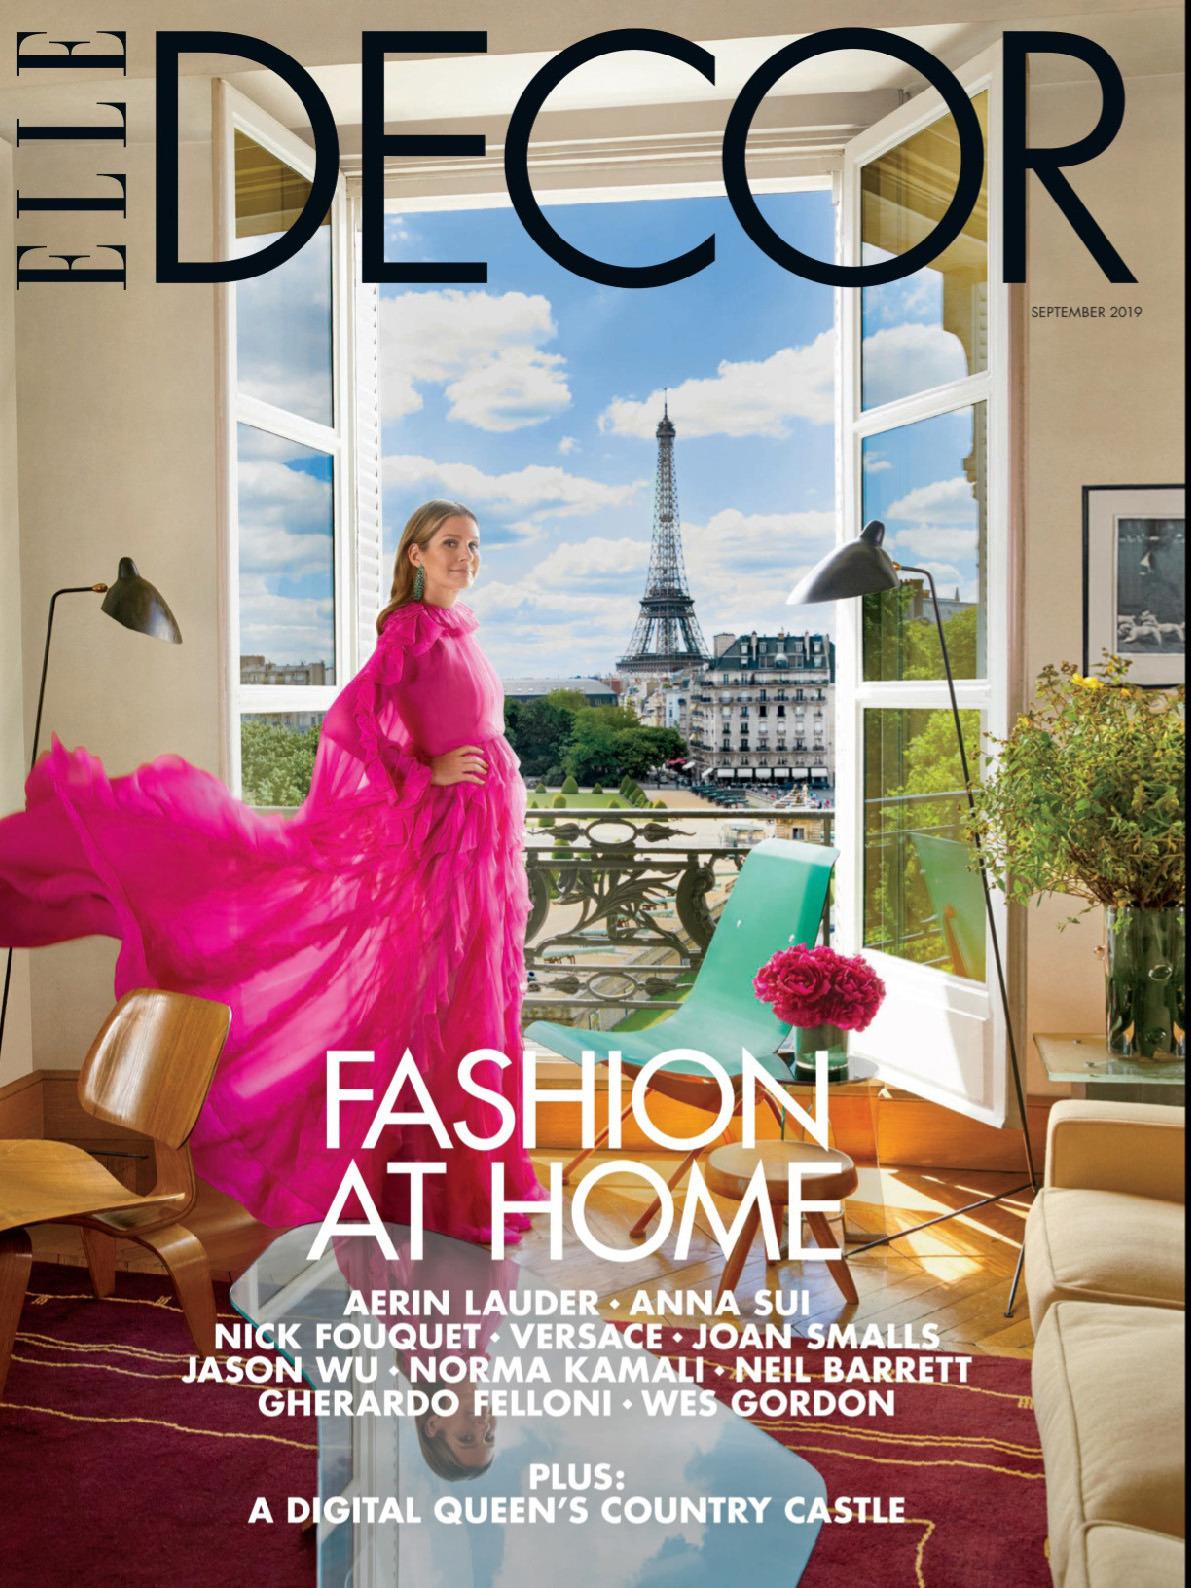 《Elle Decor》美国版时尚家居杂志2019年09月号